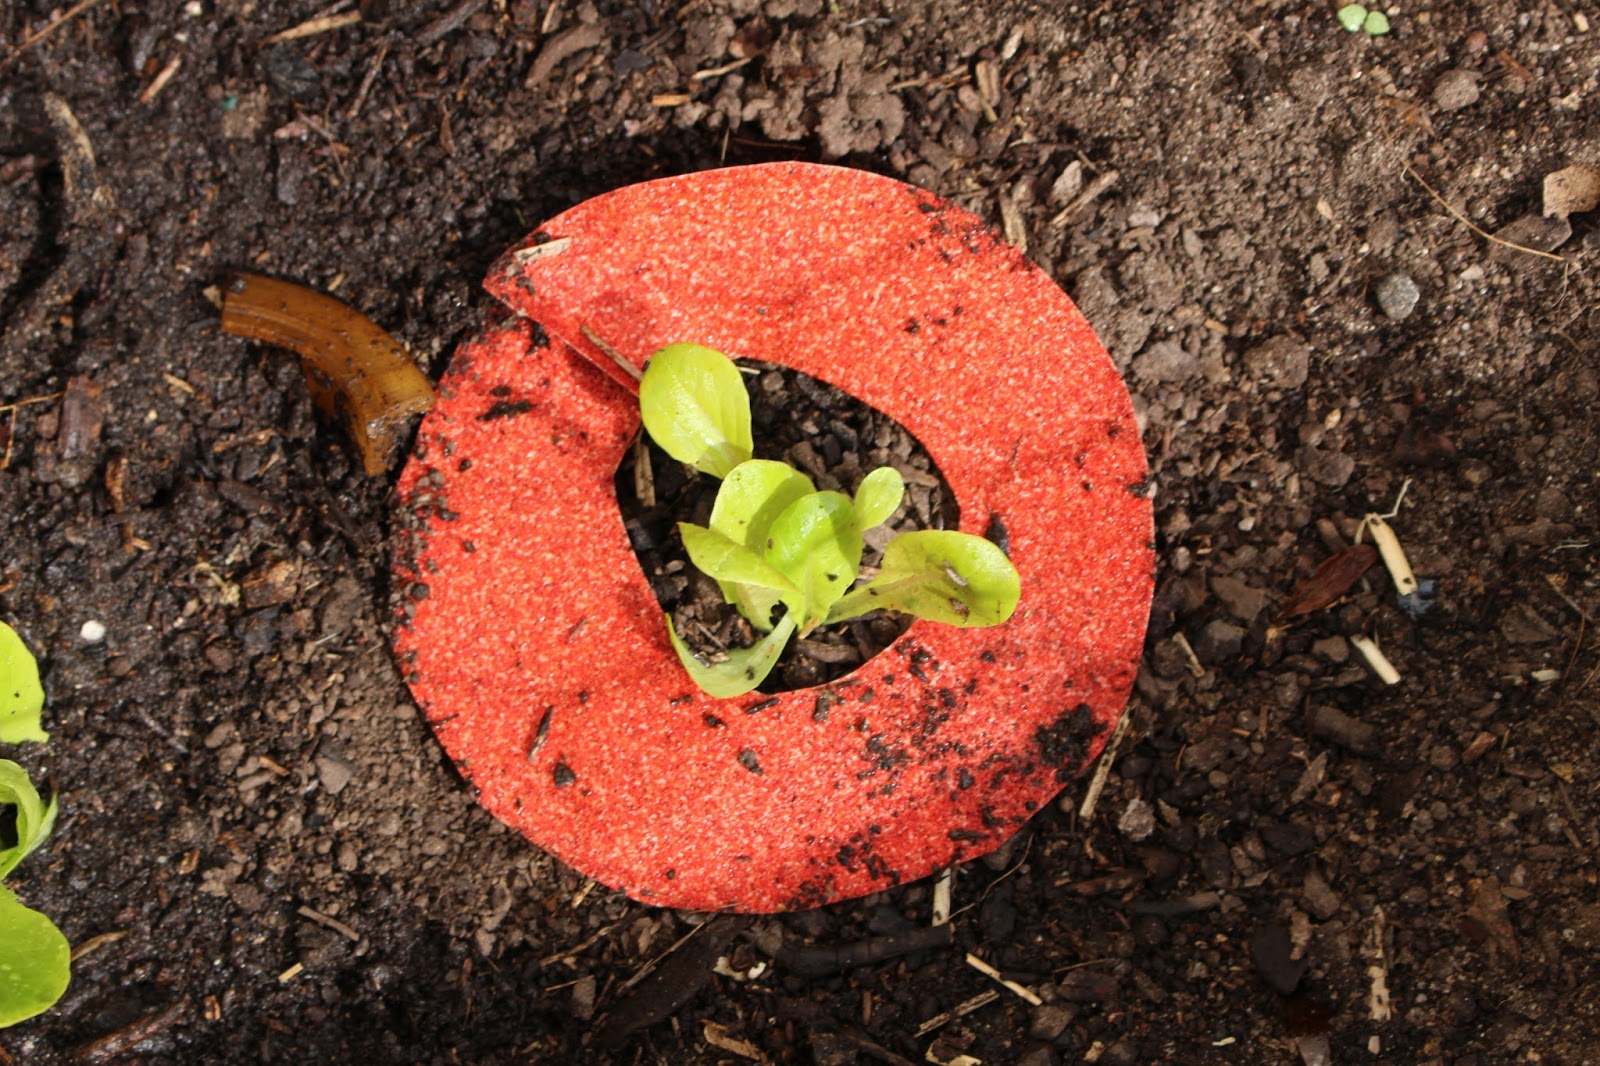 snail repellent, sandpaper donuts